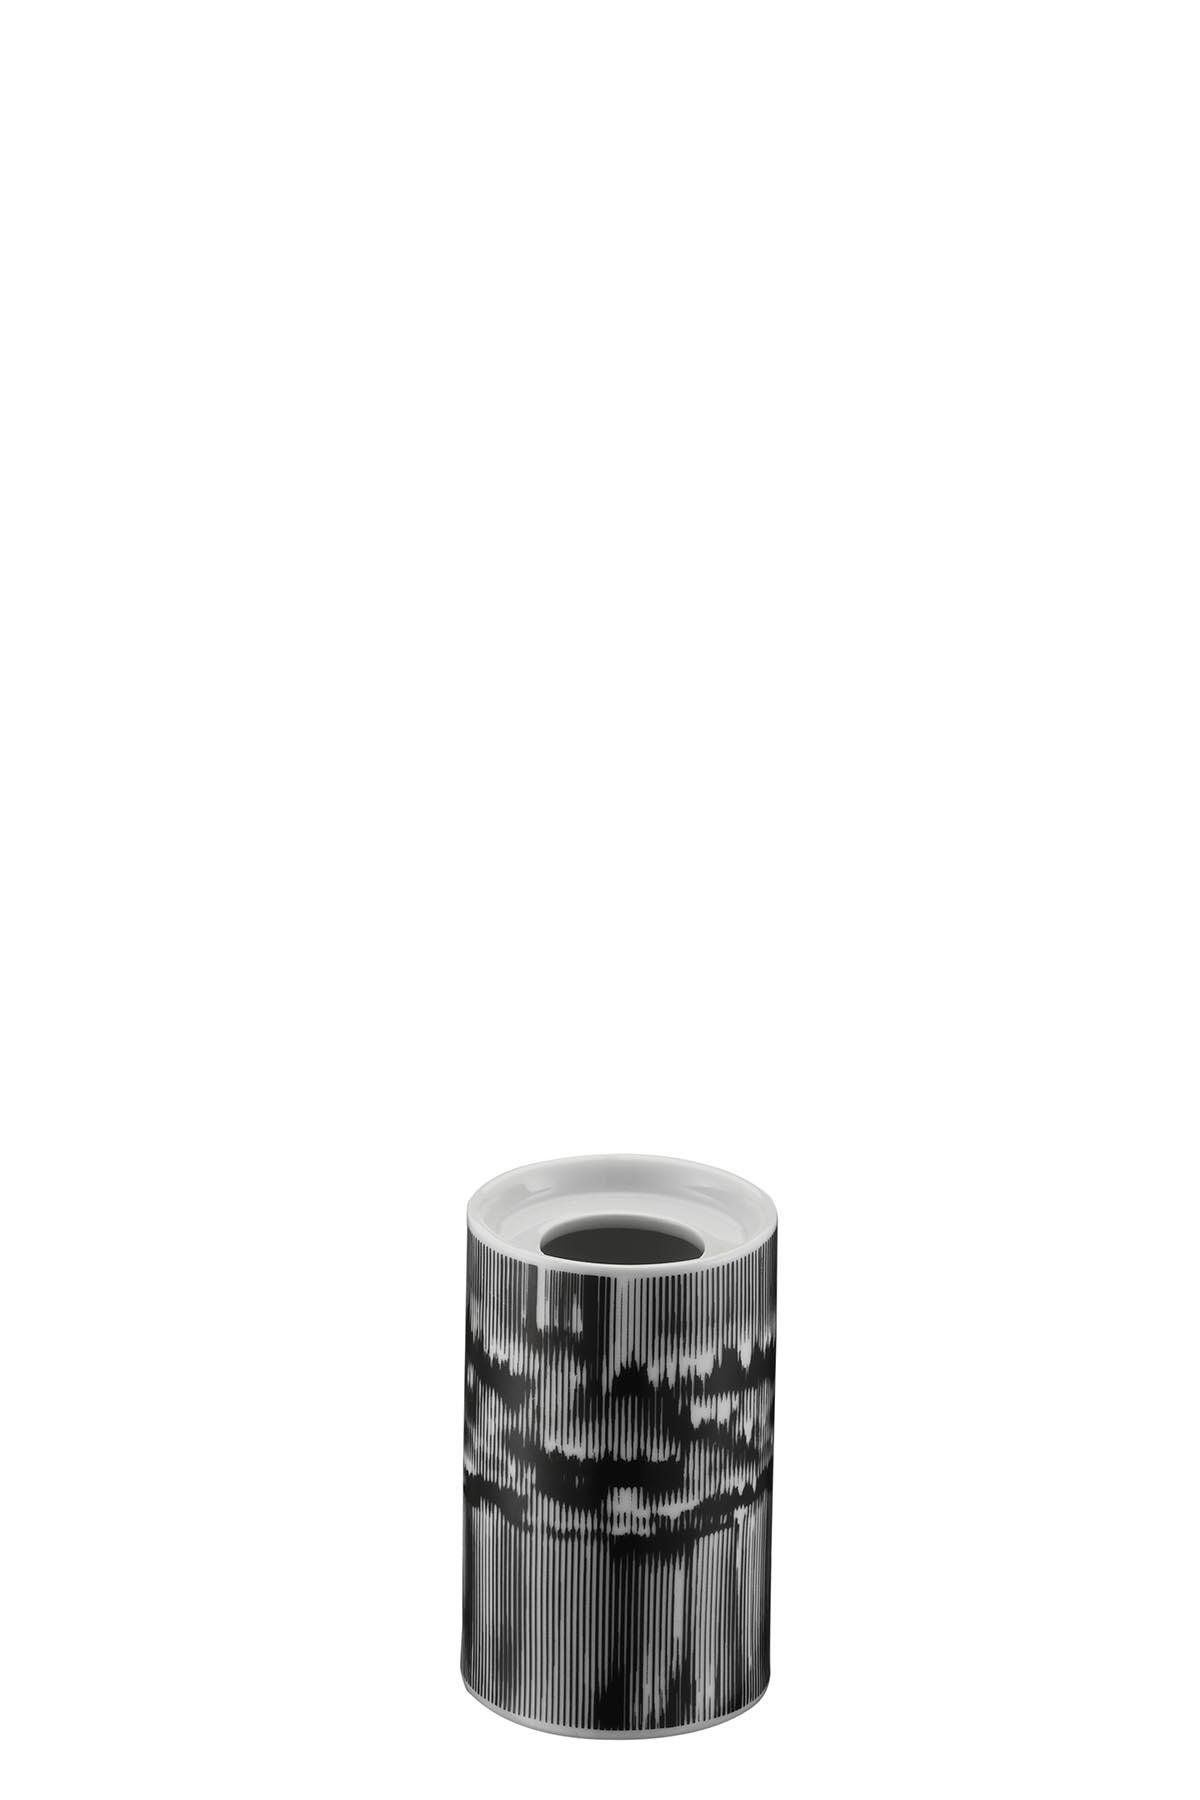 Kütahya Porselen Modern 3 Parça Vazo Takımı 11158